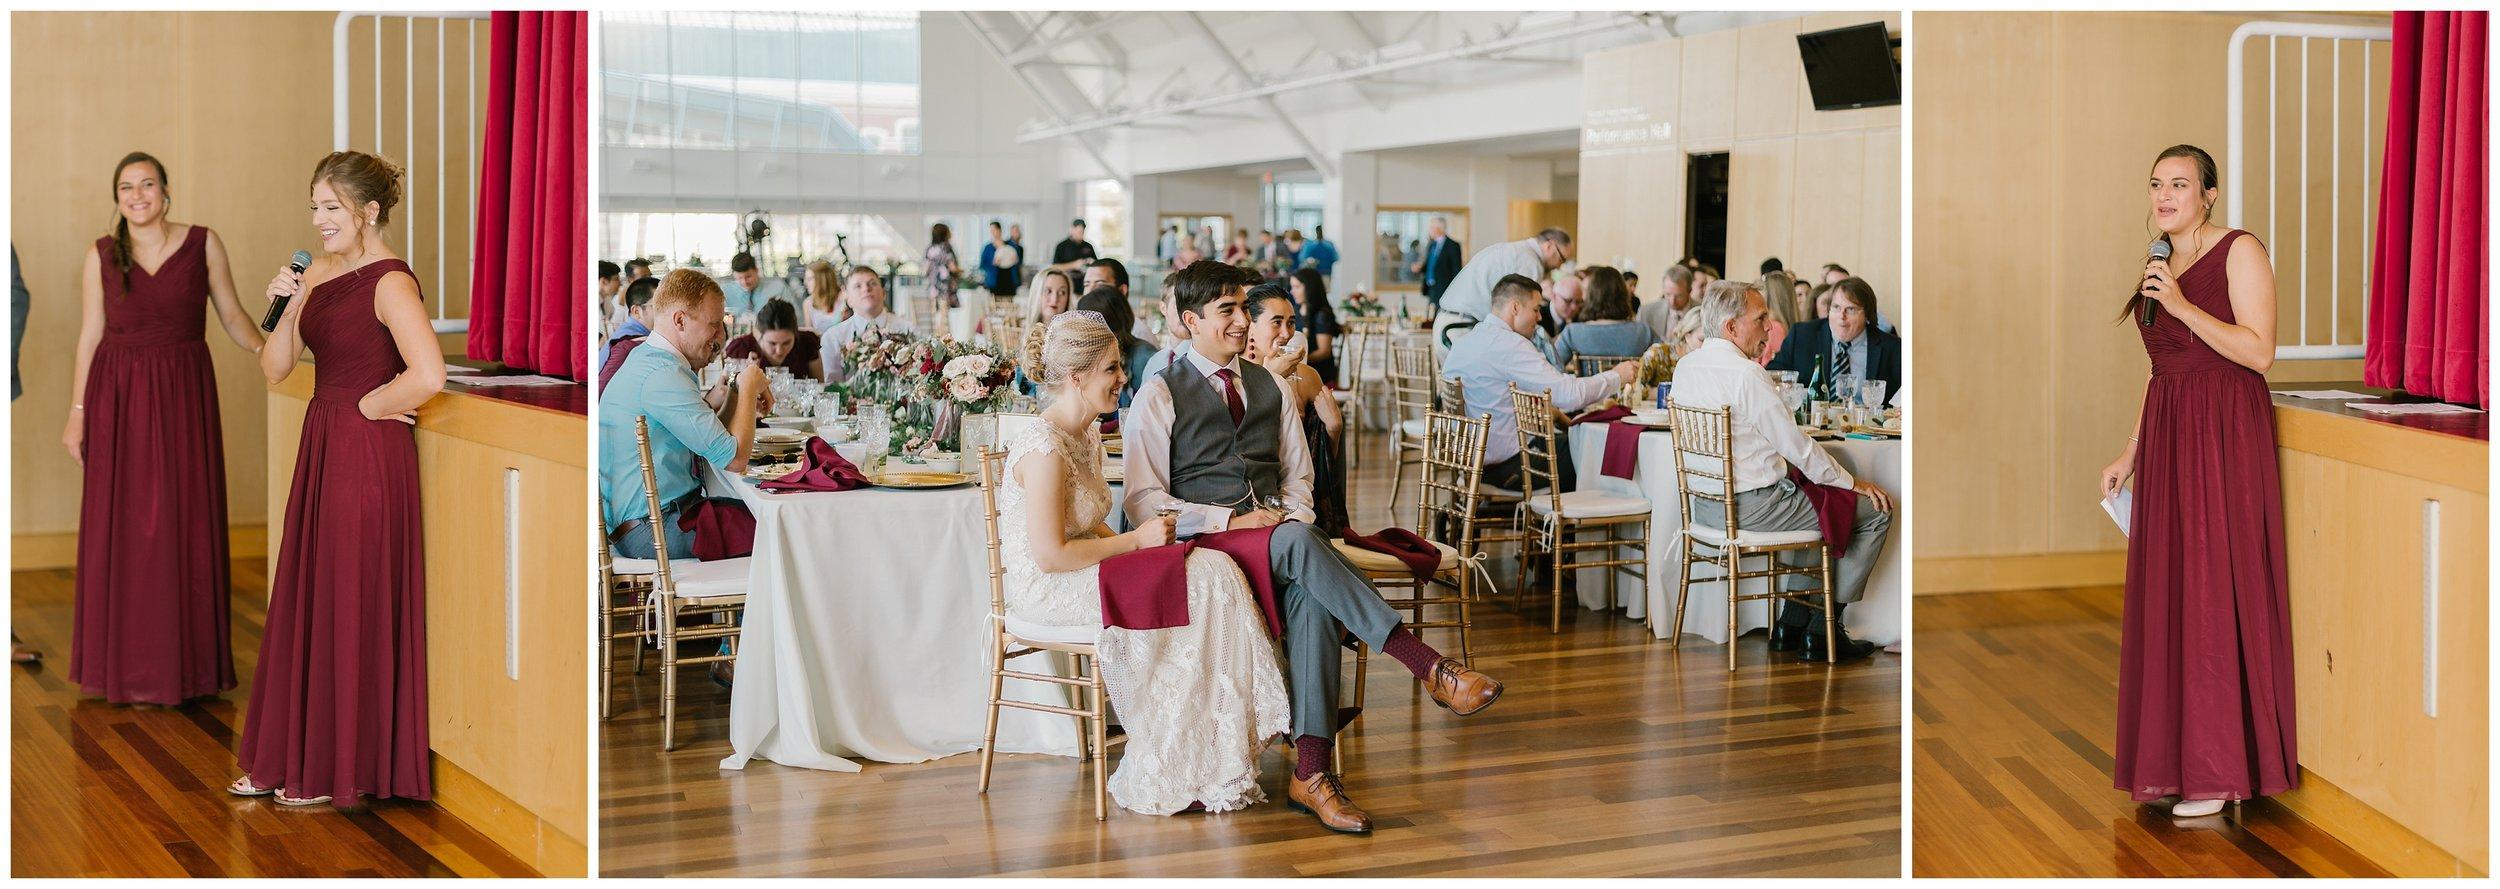 Rebecca_Shehorn_Photography_Indianapolis_Wedding_Photographer_7365.jpg